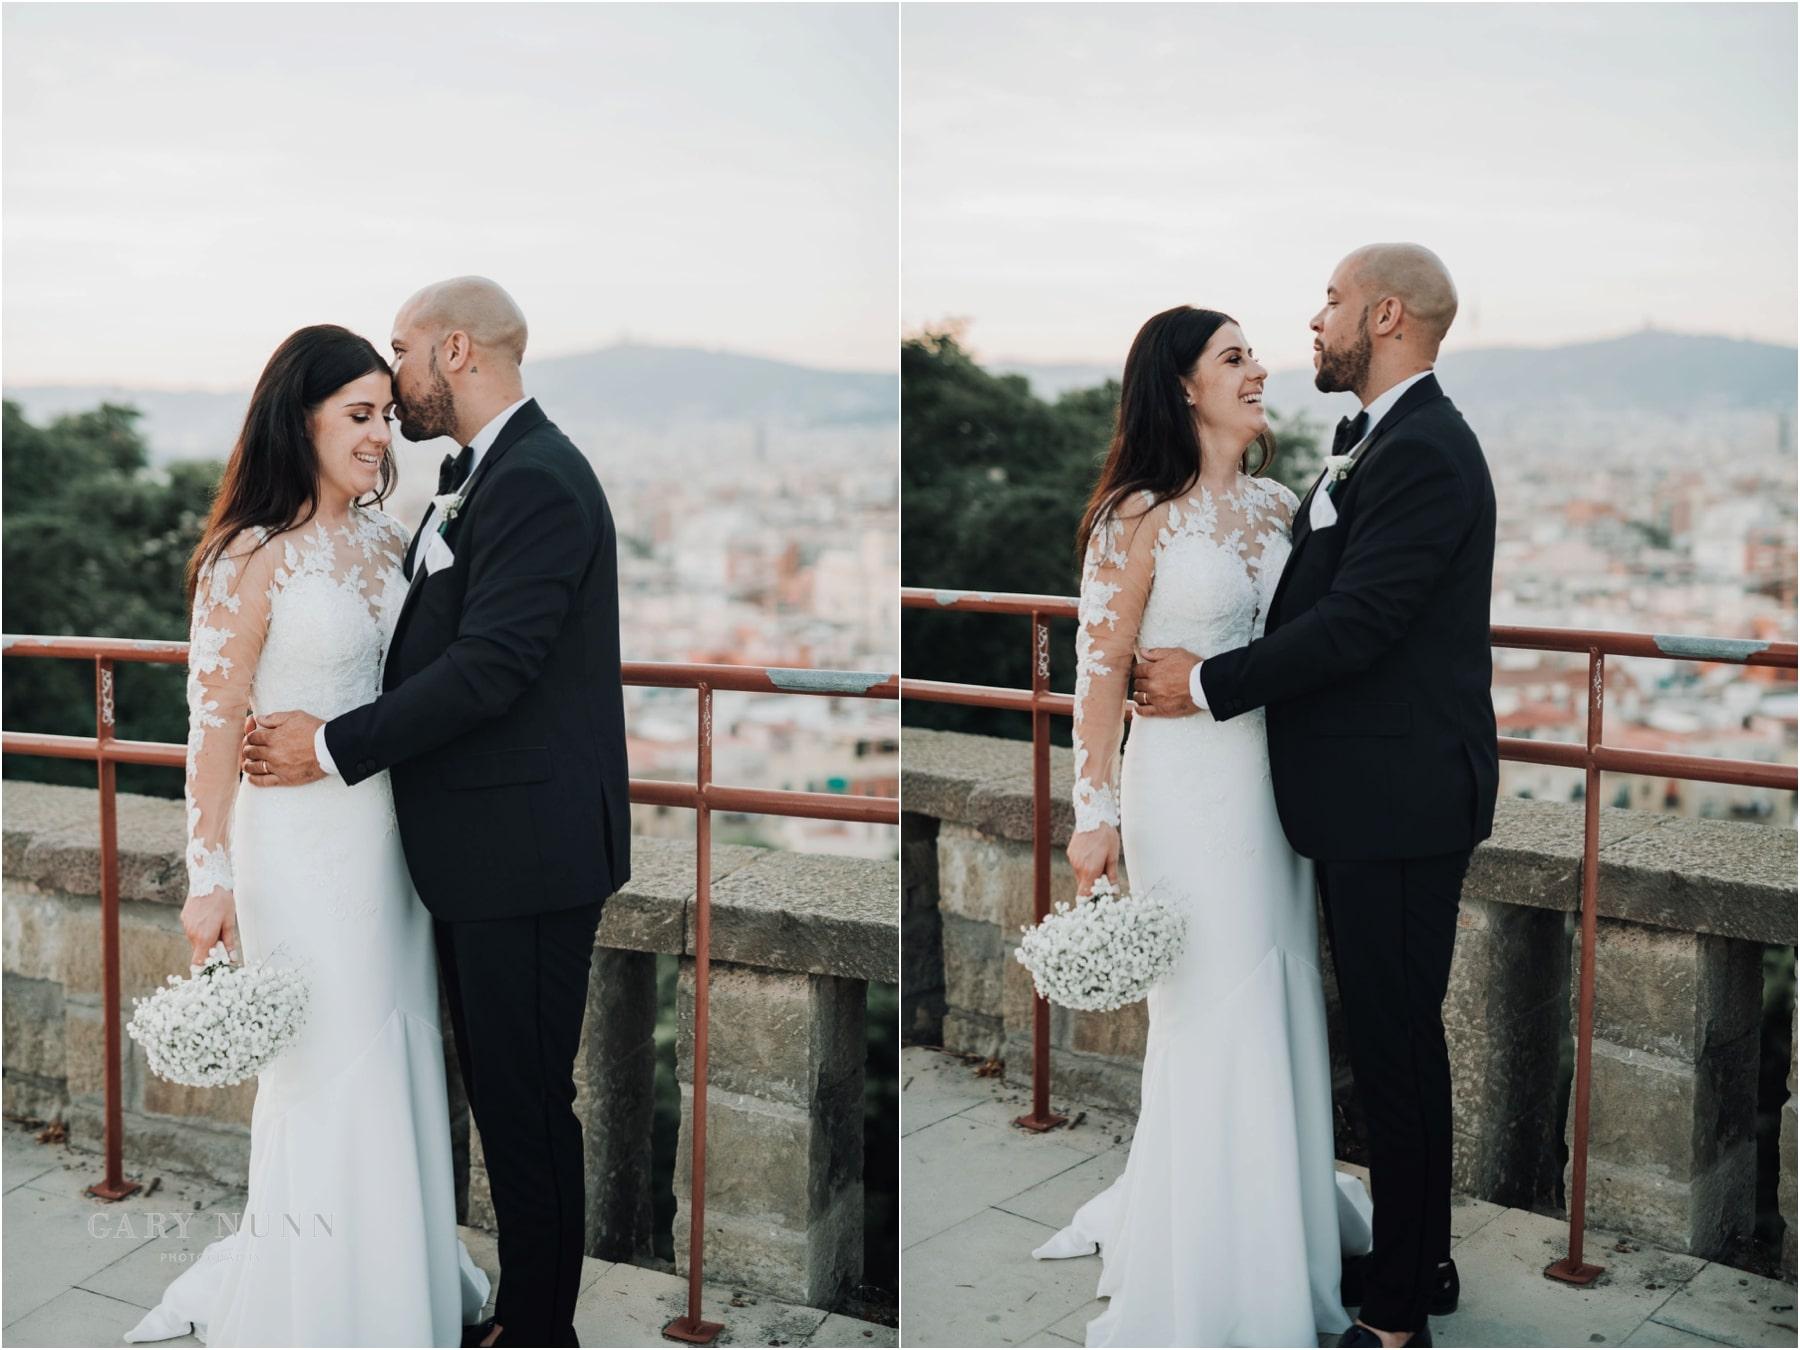 Hotel Miramar in Barcelona, destination wedding photographer, wedding photographer Milton Keynes, wedding photographer Watford, Wedding photographer, destination wedding photographer Spain